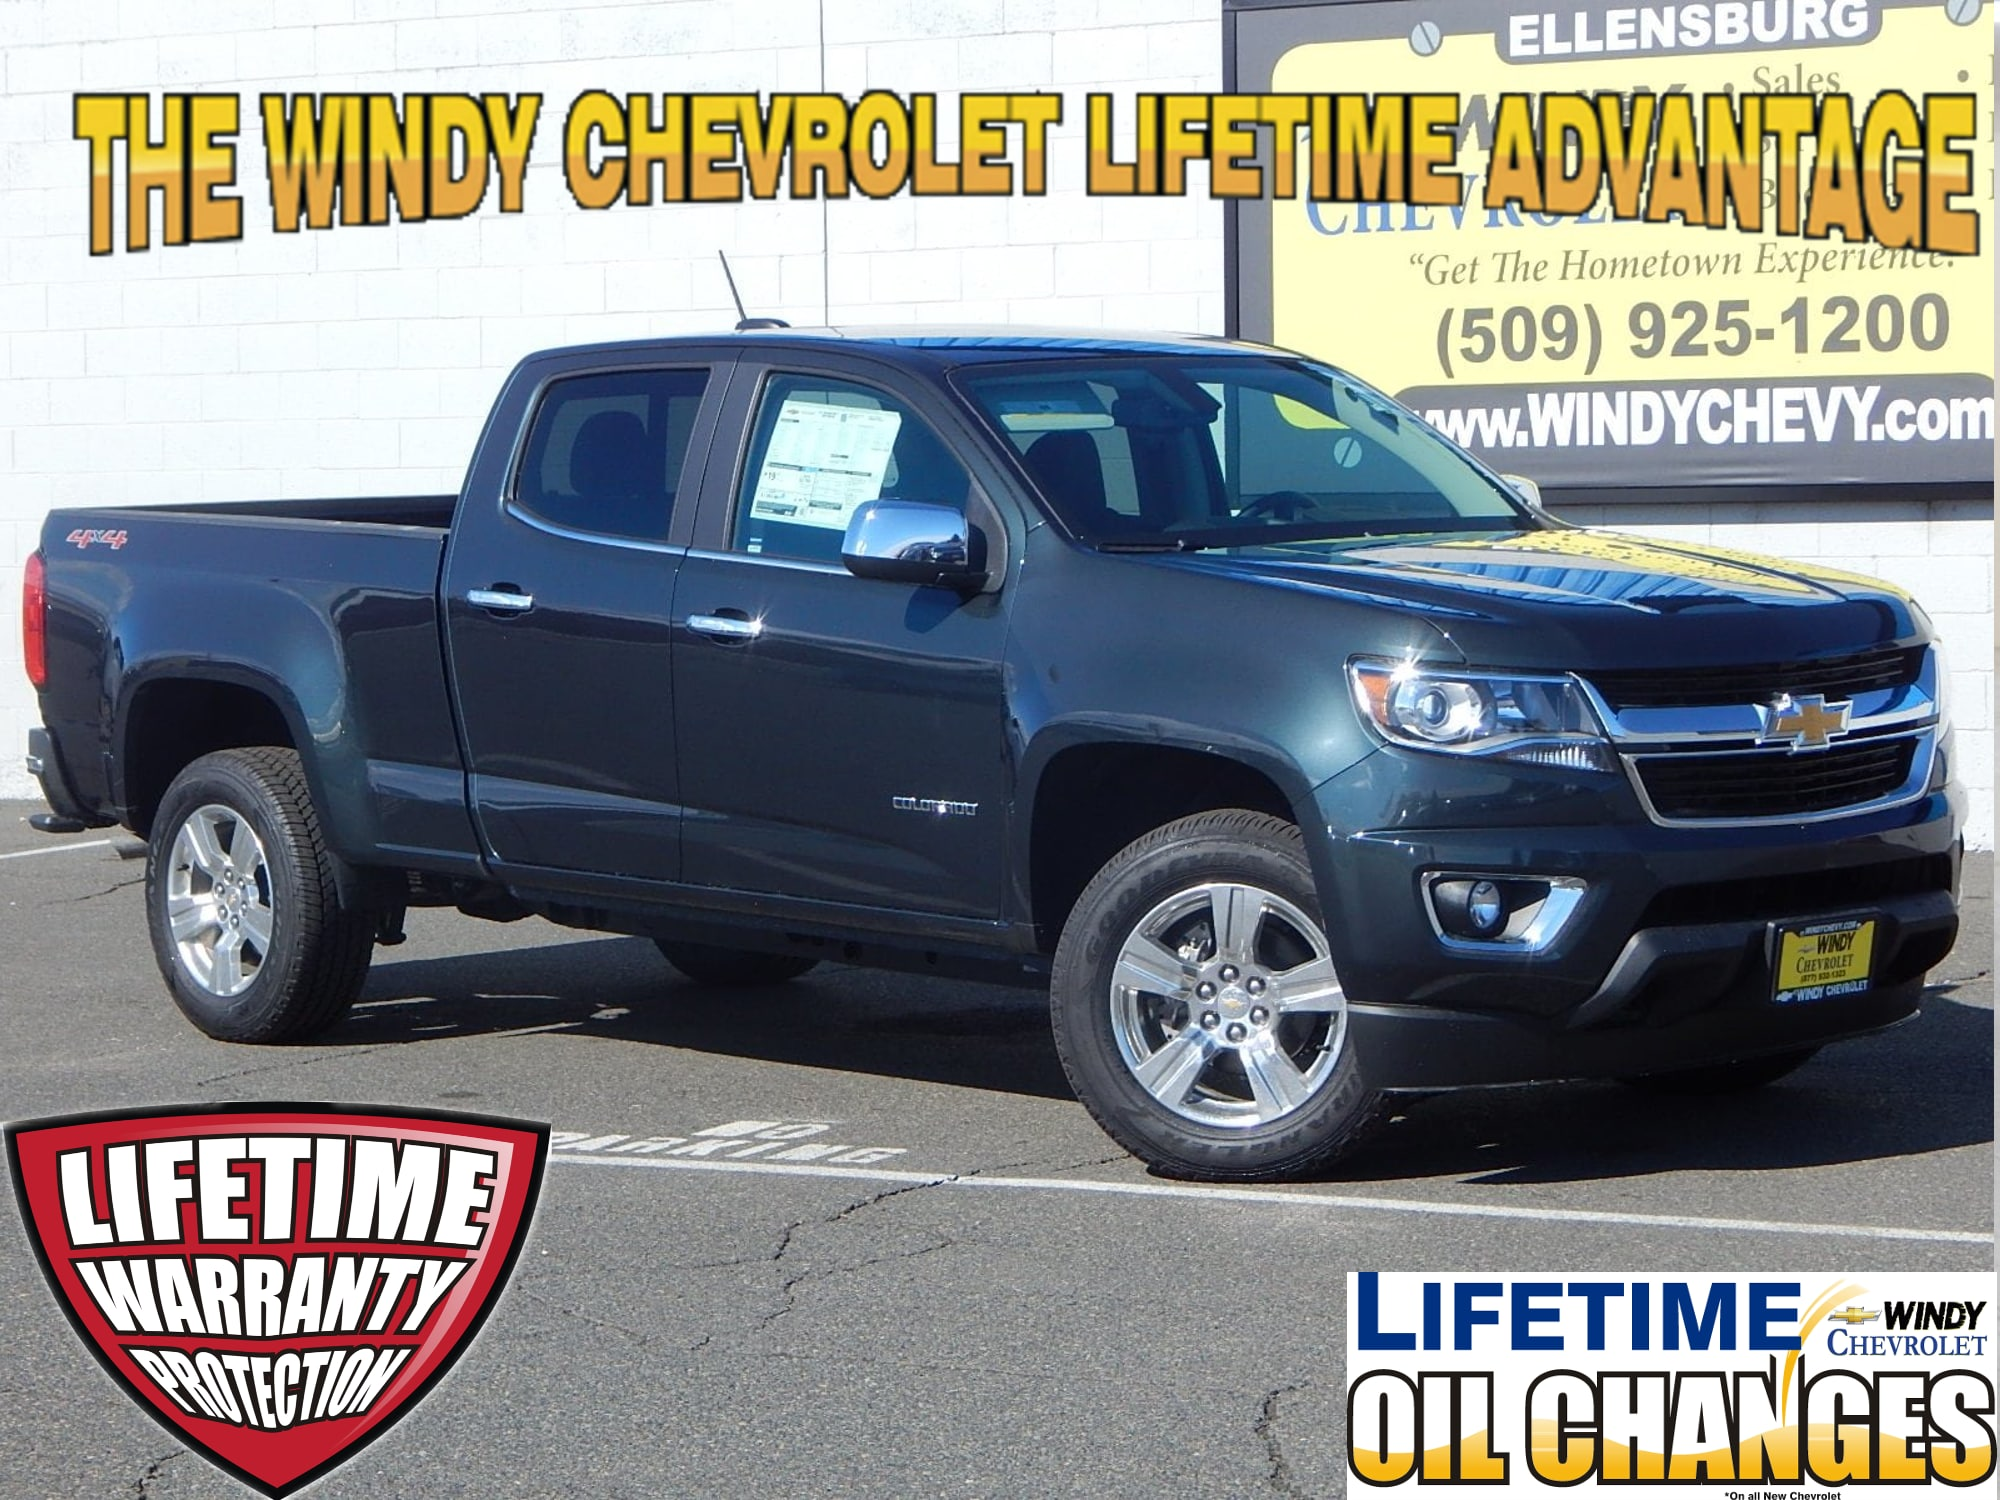 2017 Chevrolet Colorado LT Windy Chevrolet offers Lifetime Oil-Changes and Lifetime Warranty Progr